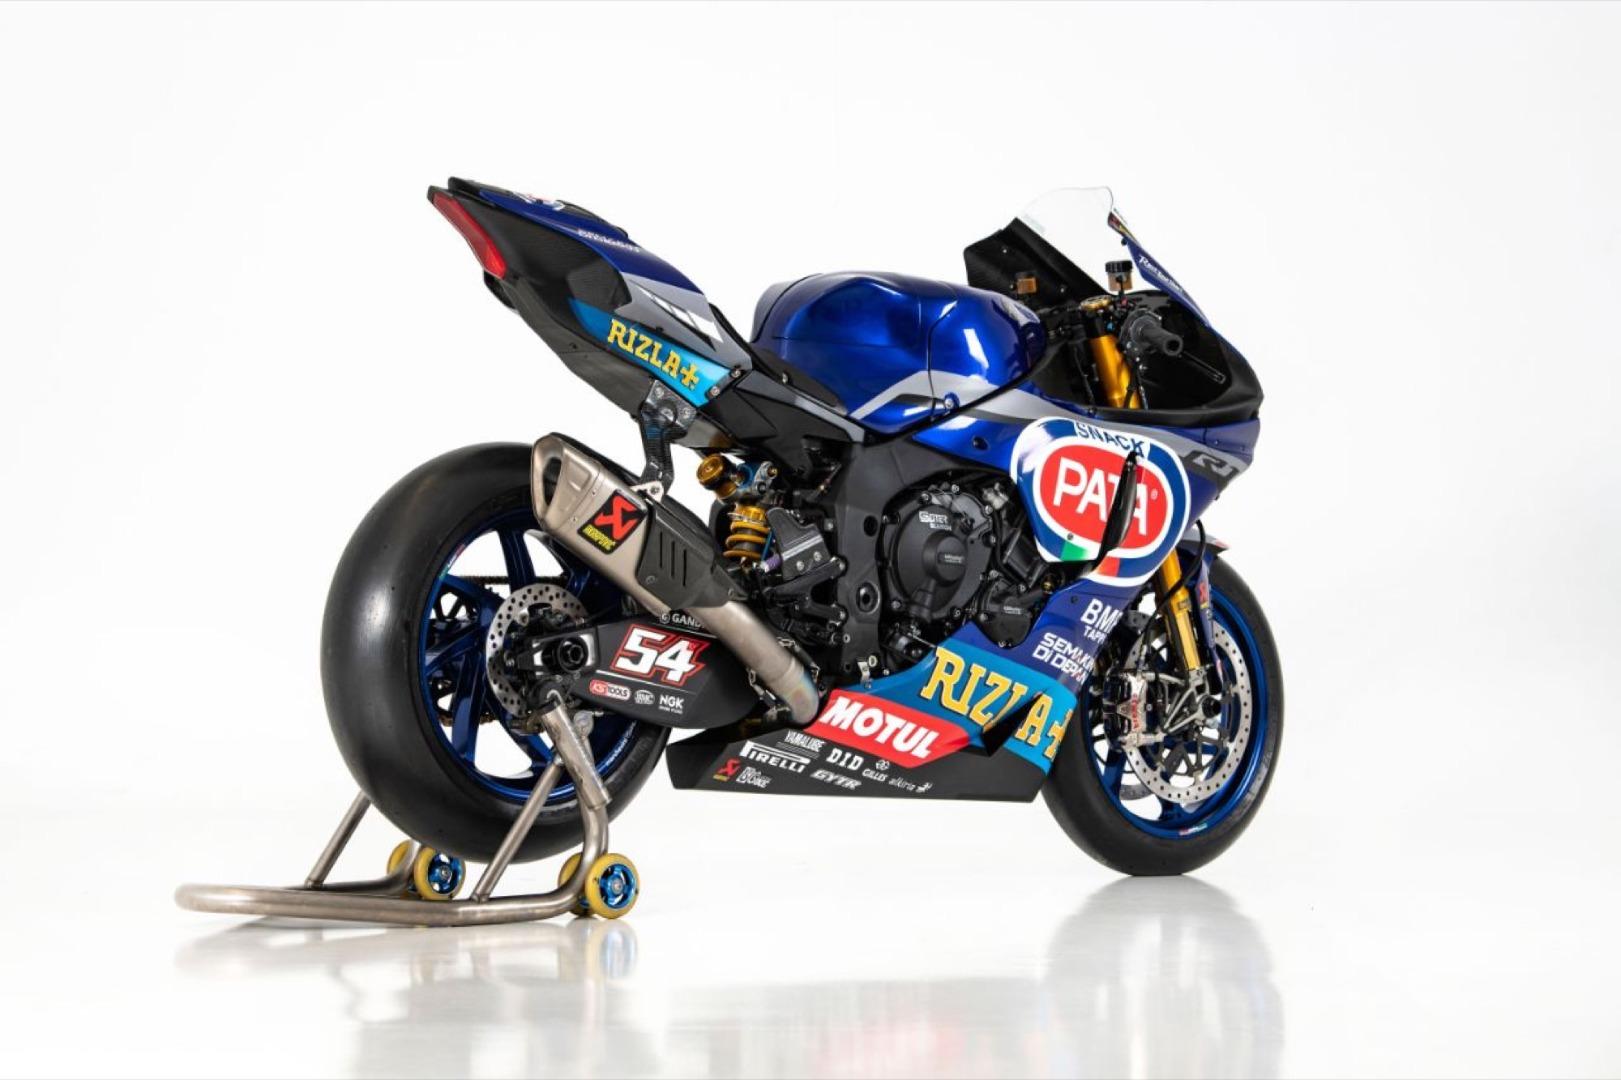 Yamaha Superbike 2020 - Michael van der Mark, Toprak Razgatlioglu, Federico Caricasulo, Garrett Gerloff y Loris Baz